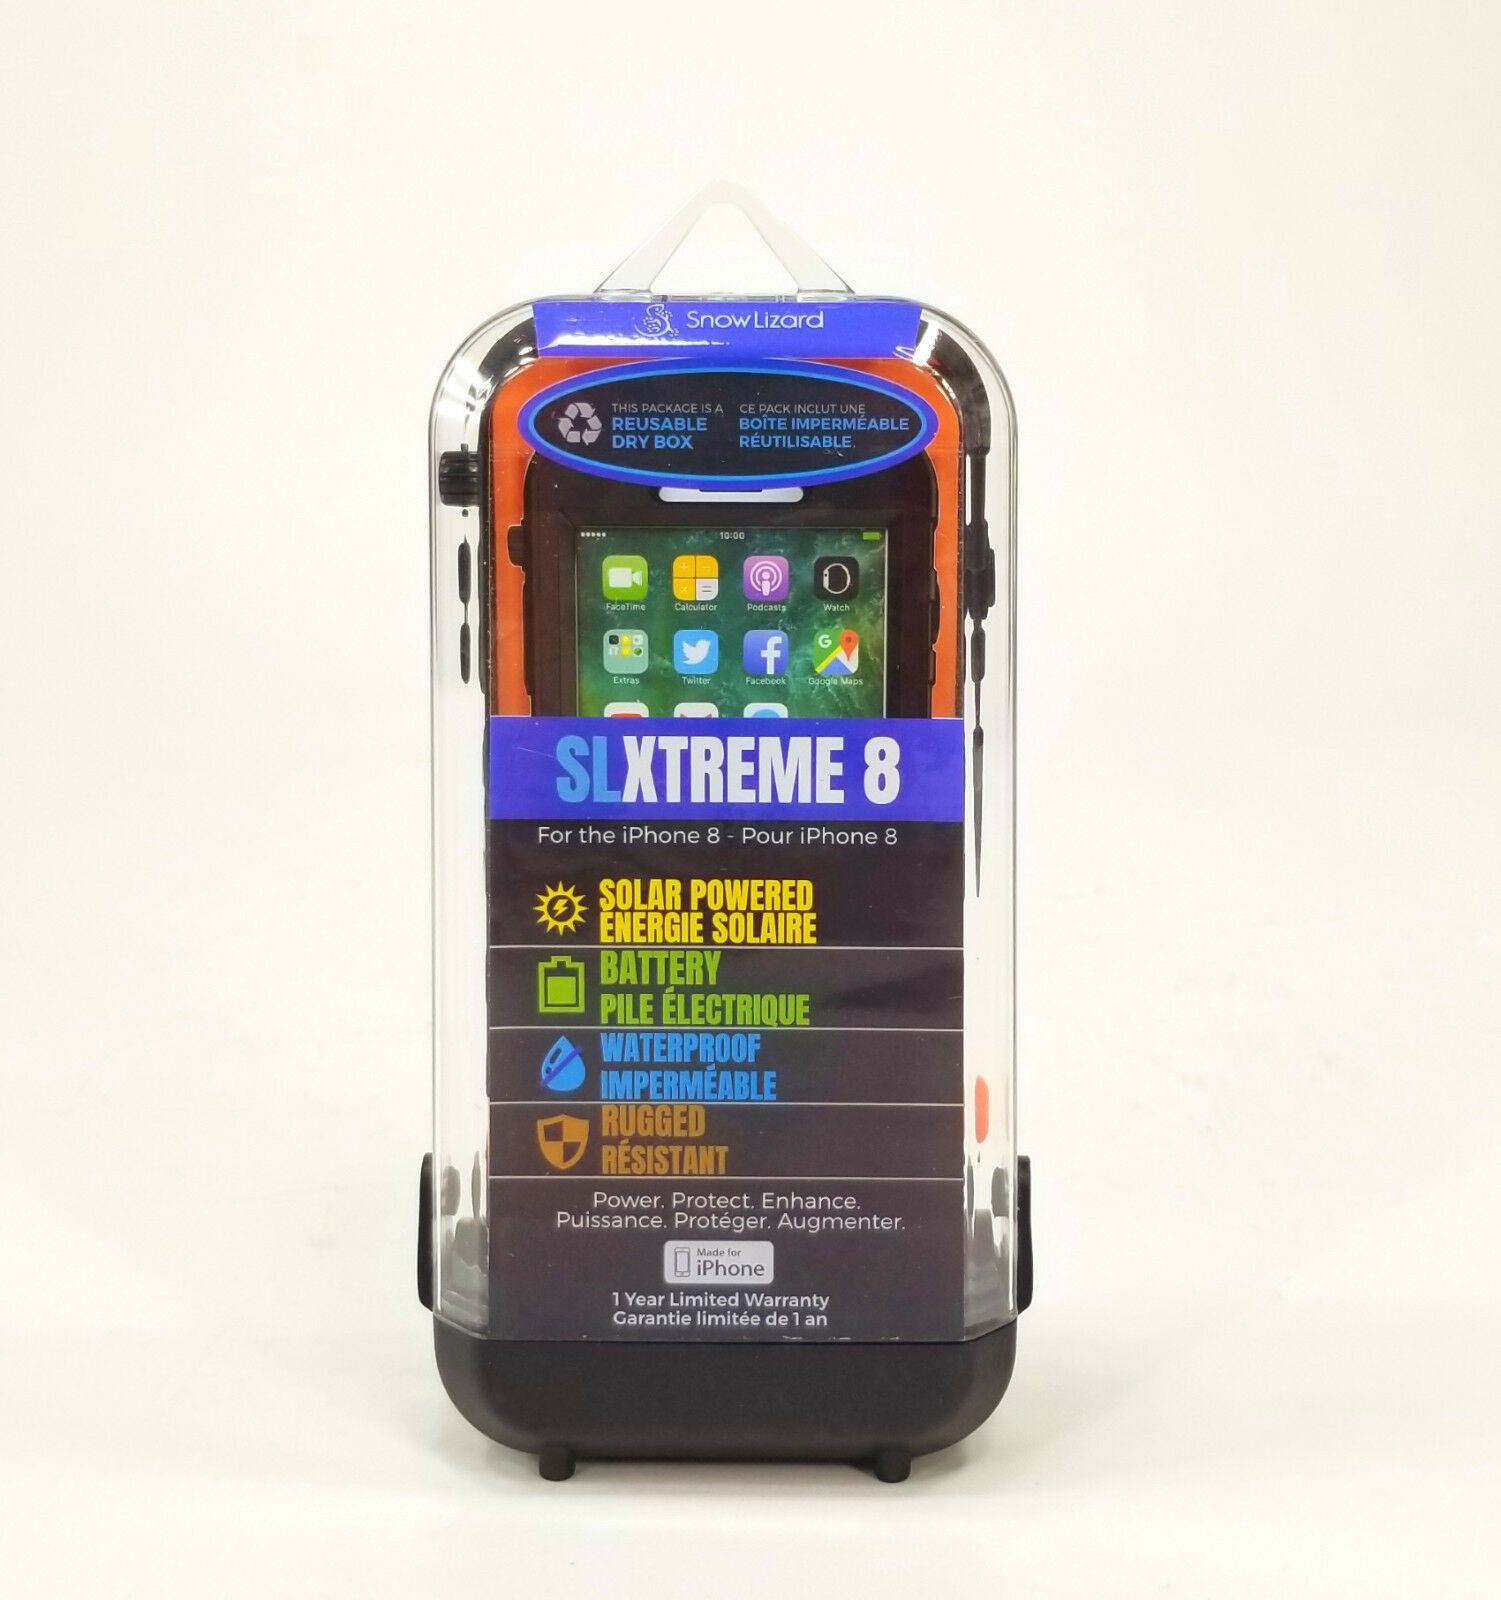 Lizard Iphone 8 7 Slxtreme,orange,SLZ-03829,Solar Charge,Waterproof,Battery